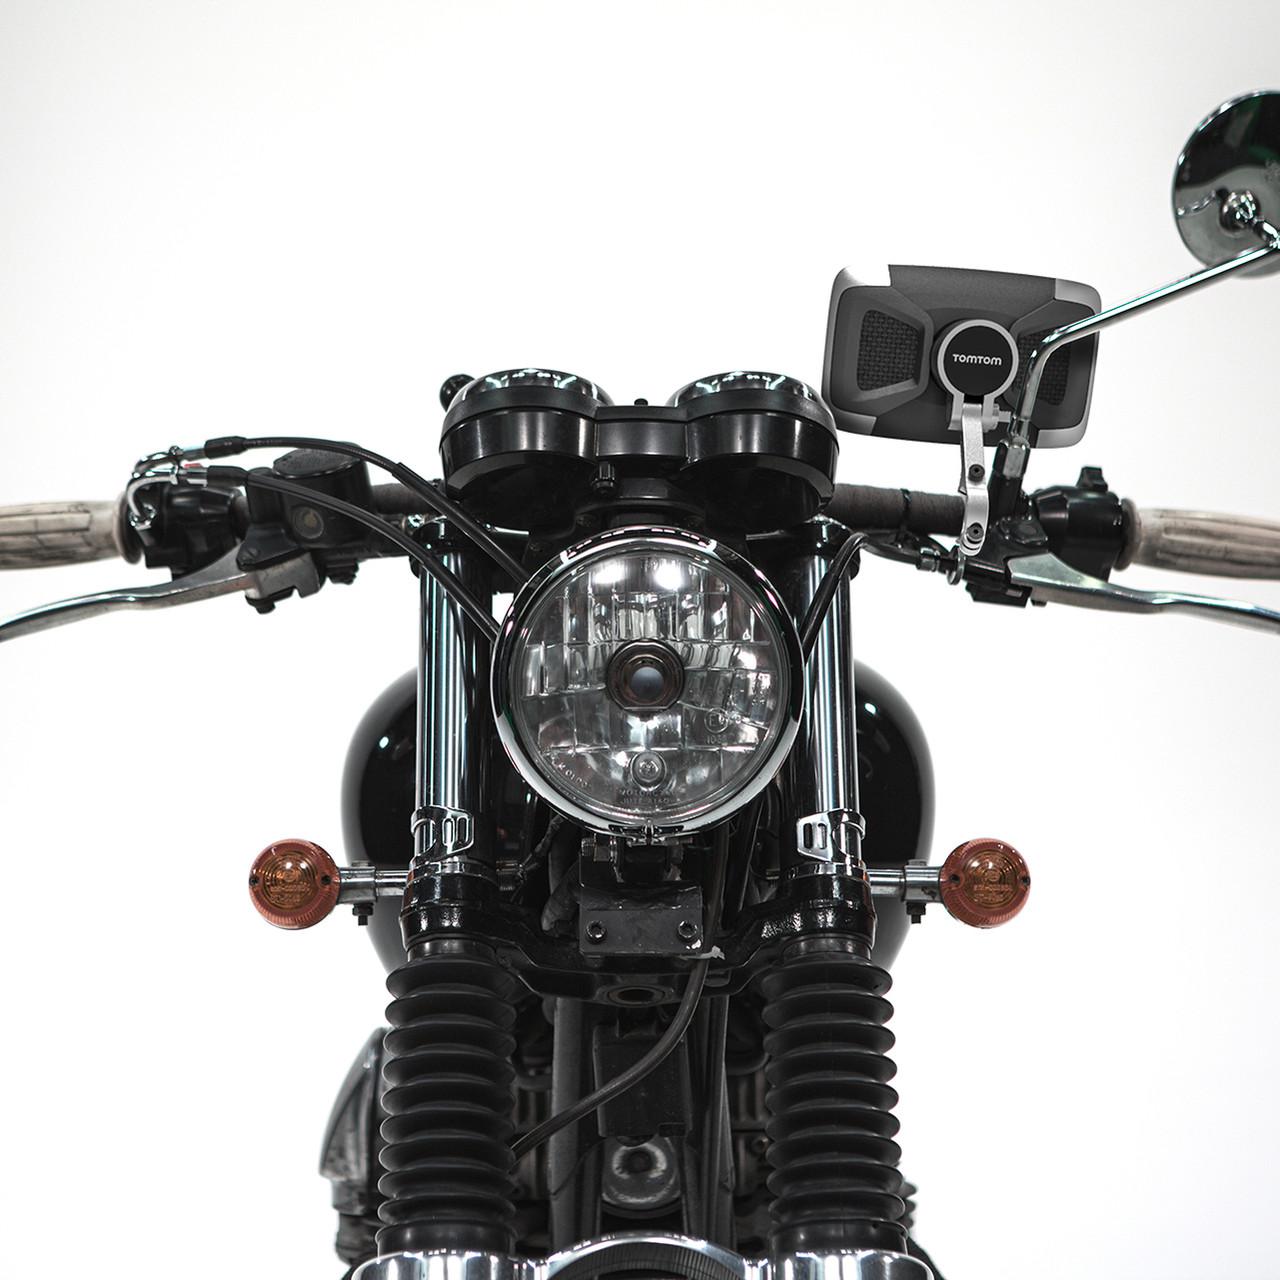 TOMTOM Motorcycle Navigation